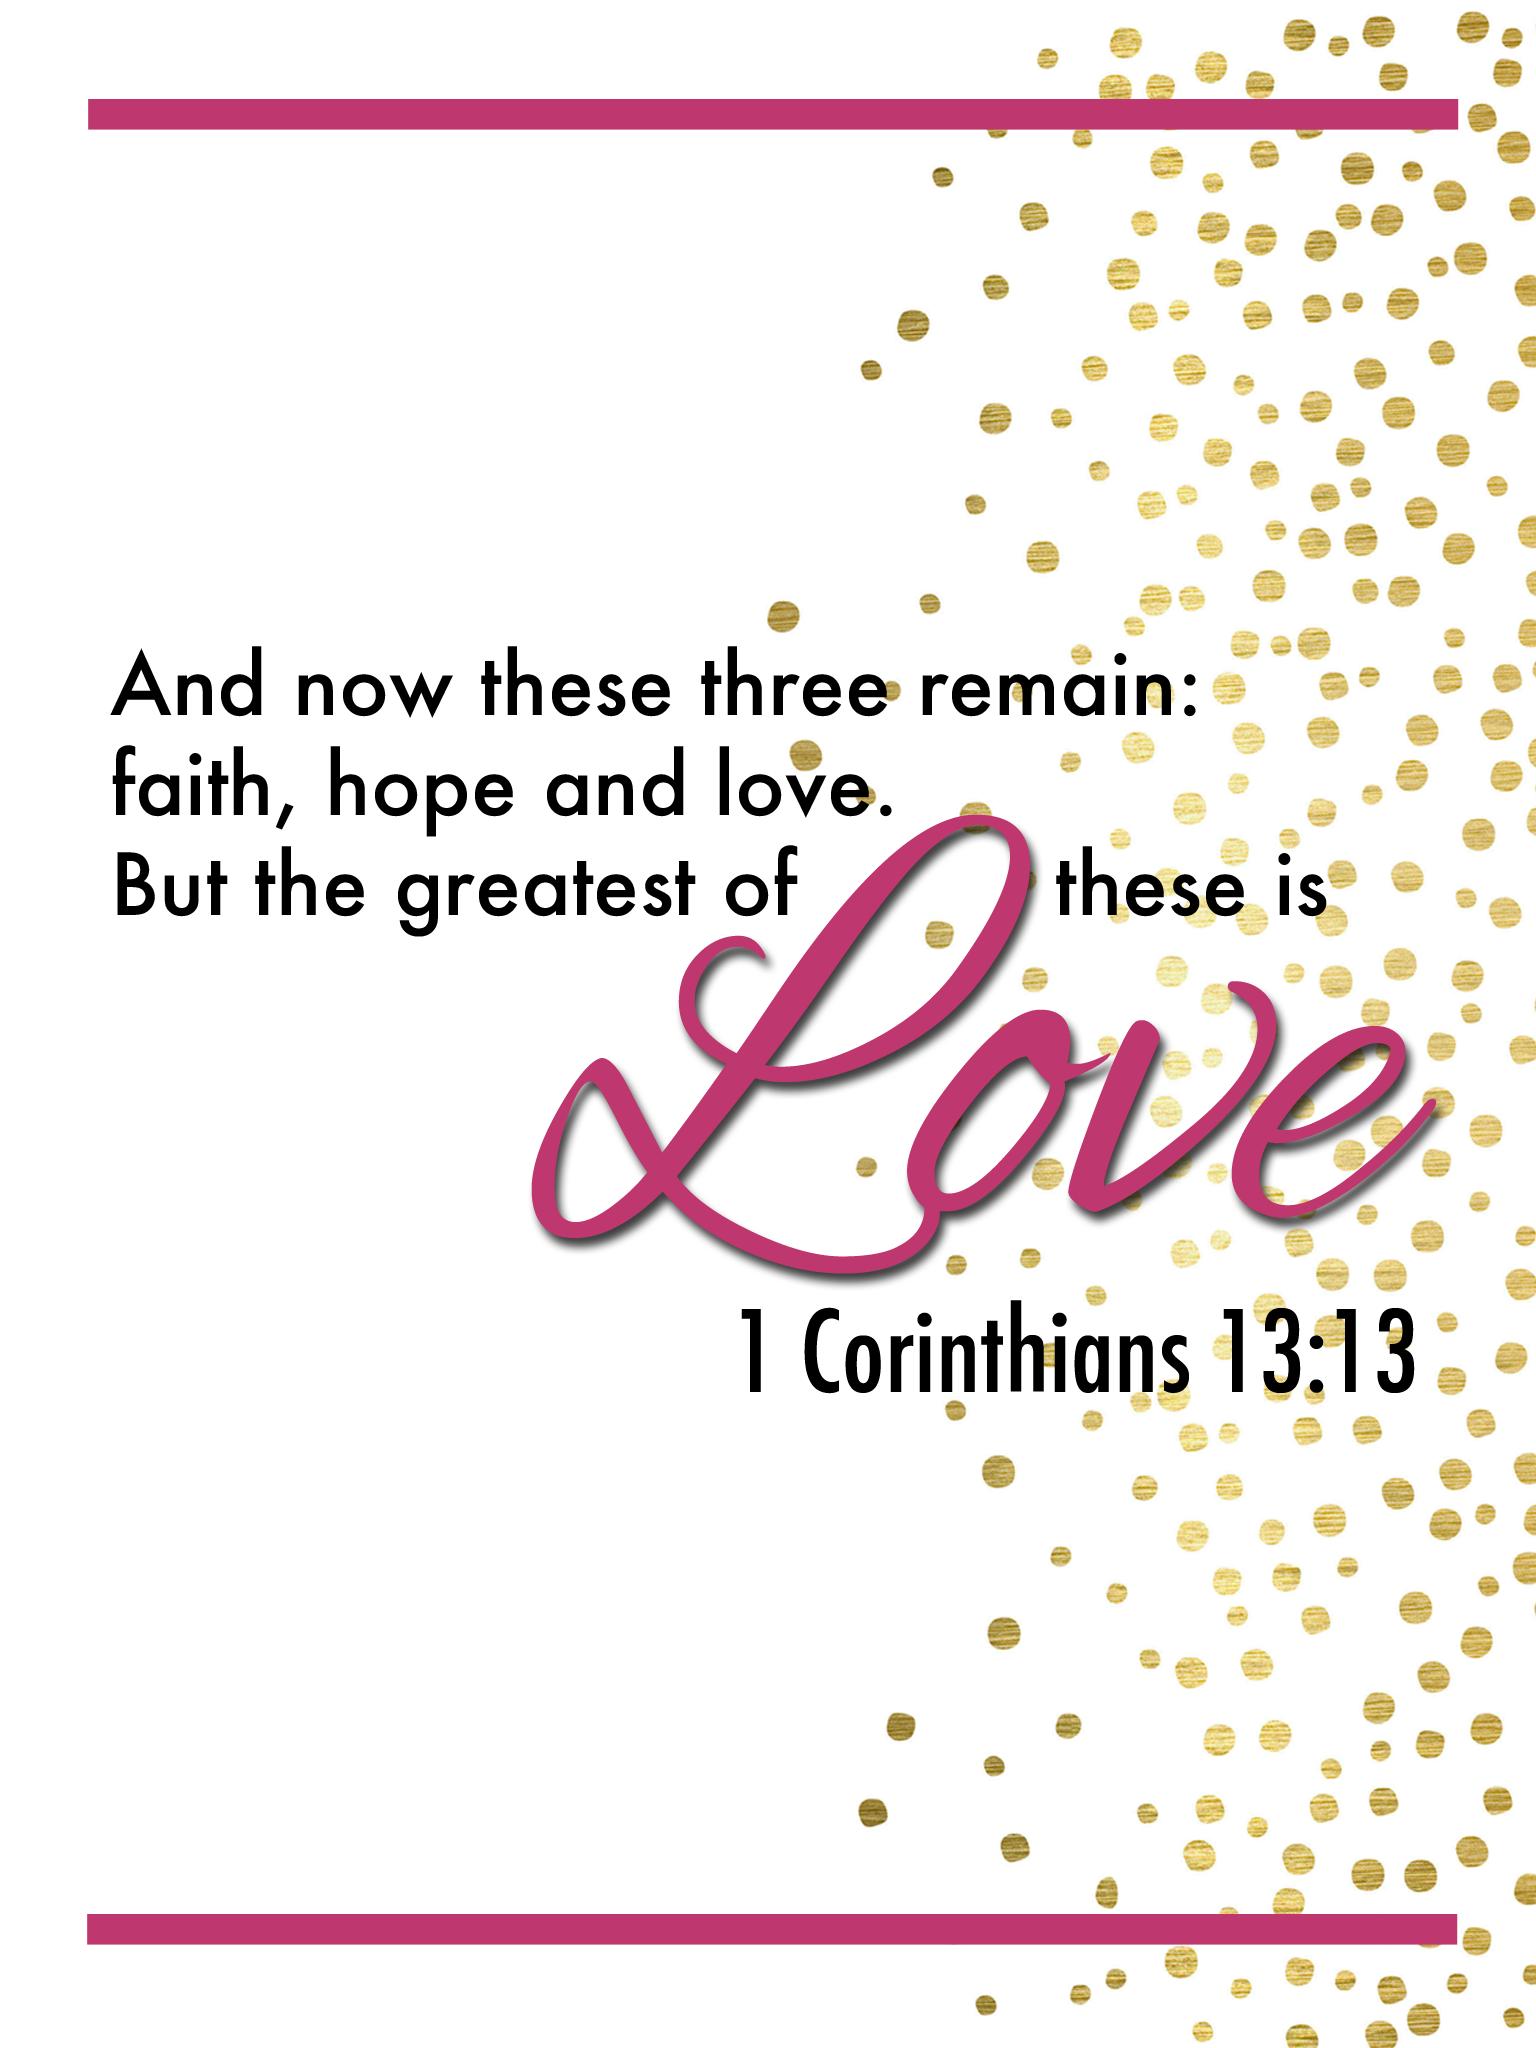 Exclusive iFaith bundle pack for #faithjourney community VIPs | www.chamelevans.com